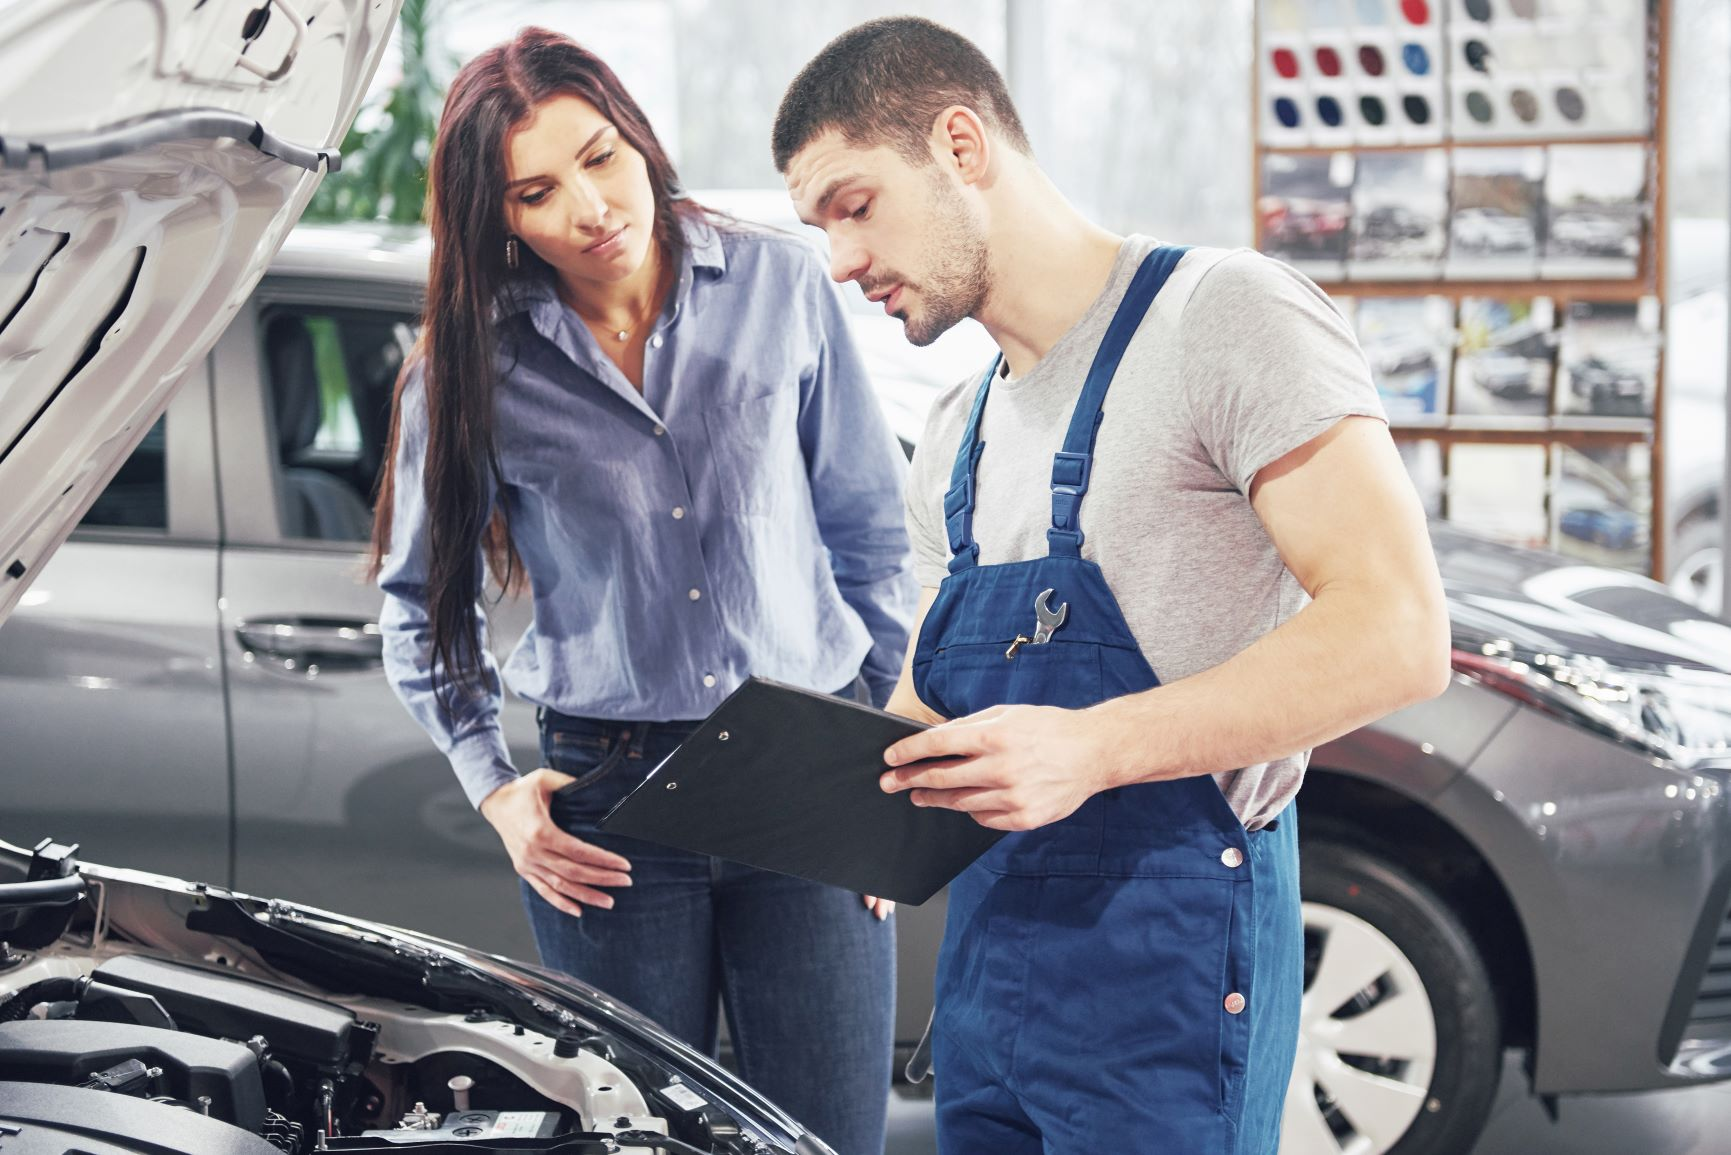 car mechanic with female customer